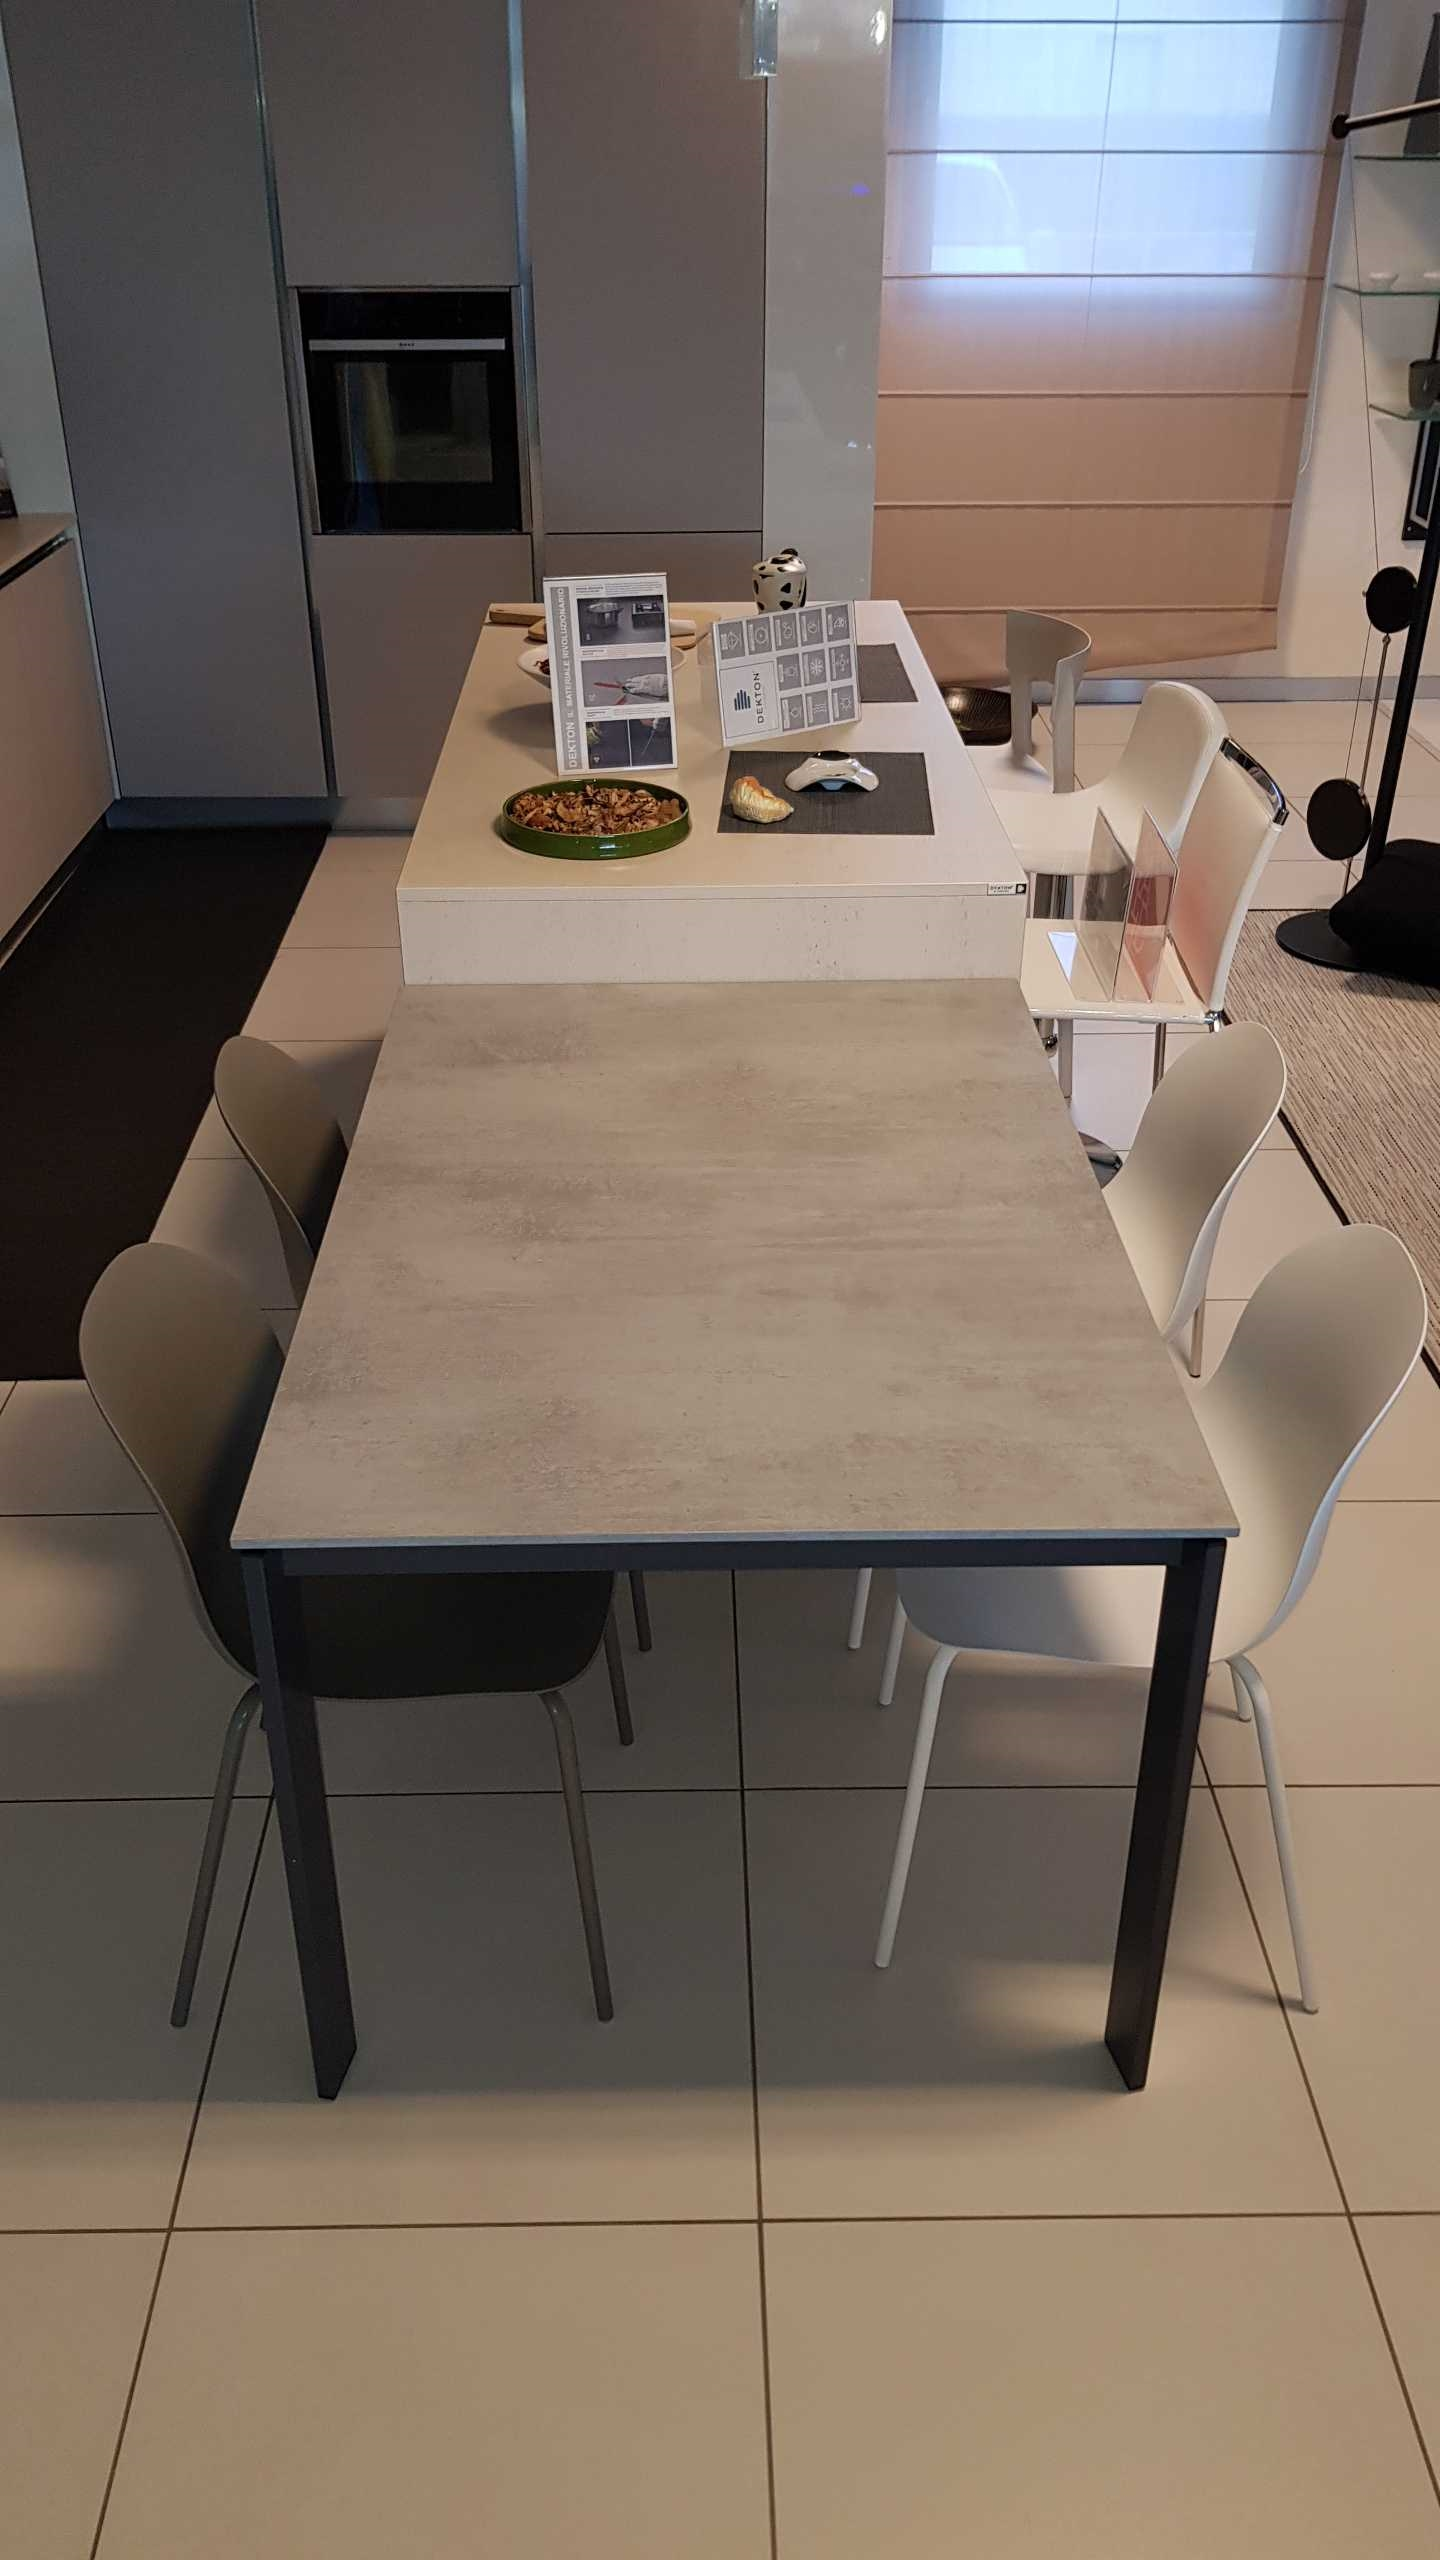 Outlet tavolo calligaris eminence tavoli a prezzi scontati for Outlet tavoli design